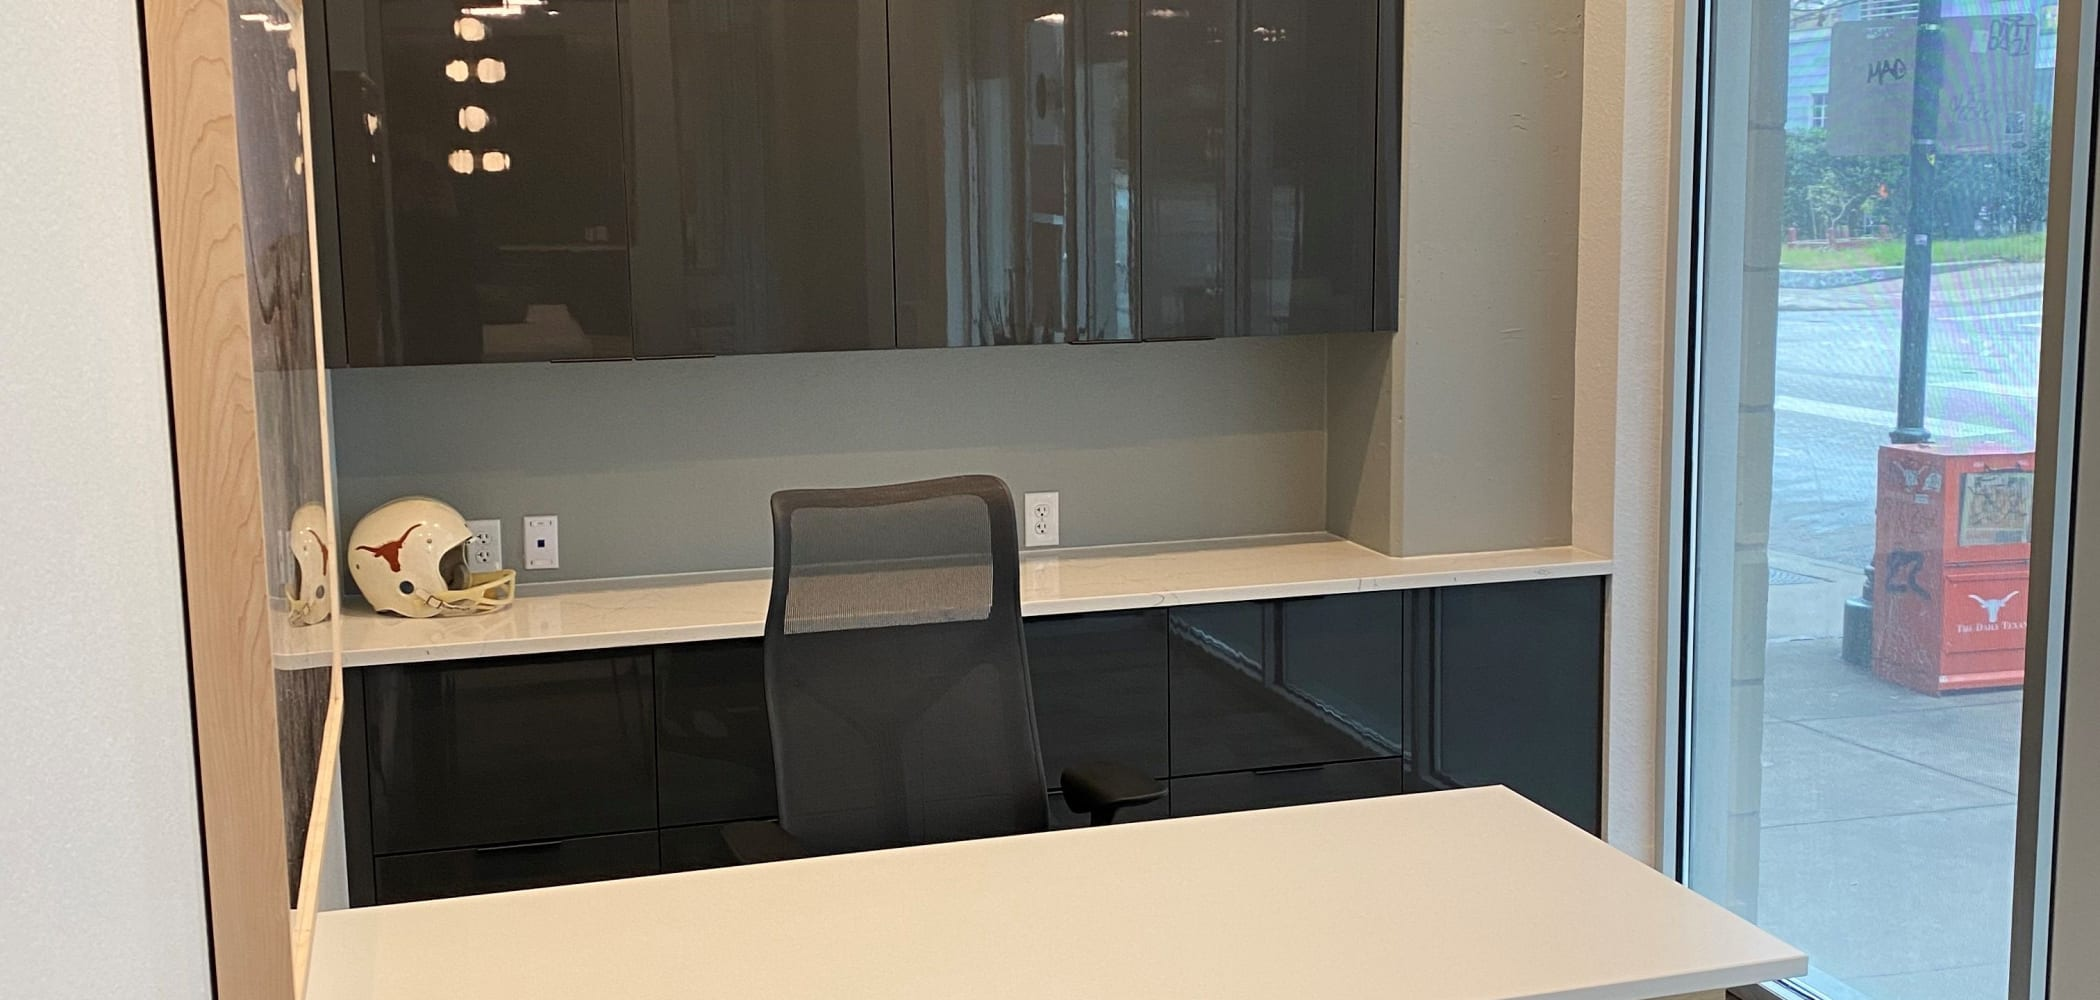 An office room at 21 Rio in Austin, Texas